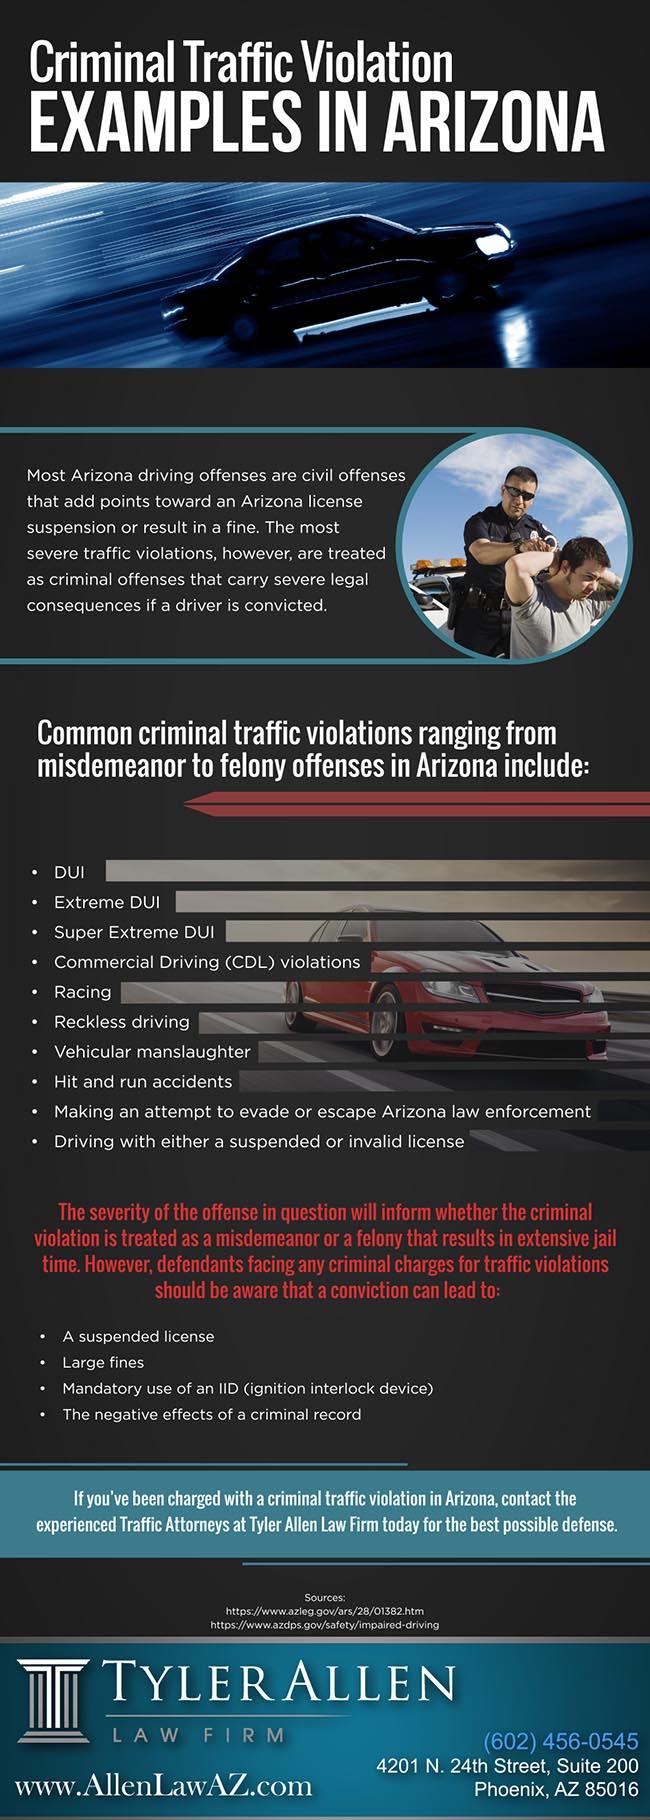 Criminal Traffic Violation Examples in Arizona